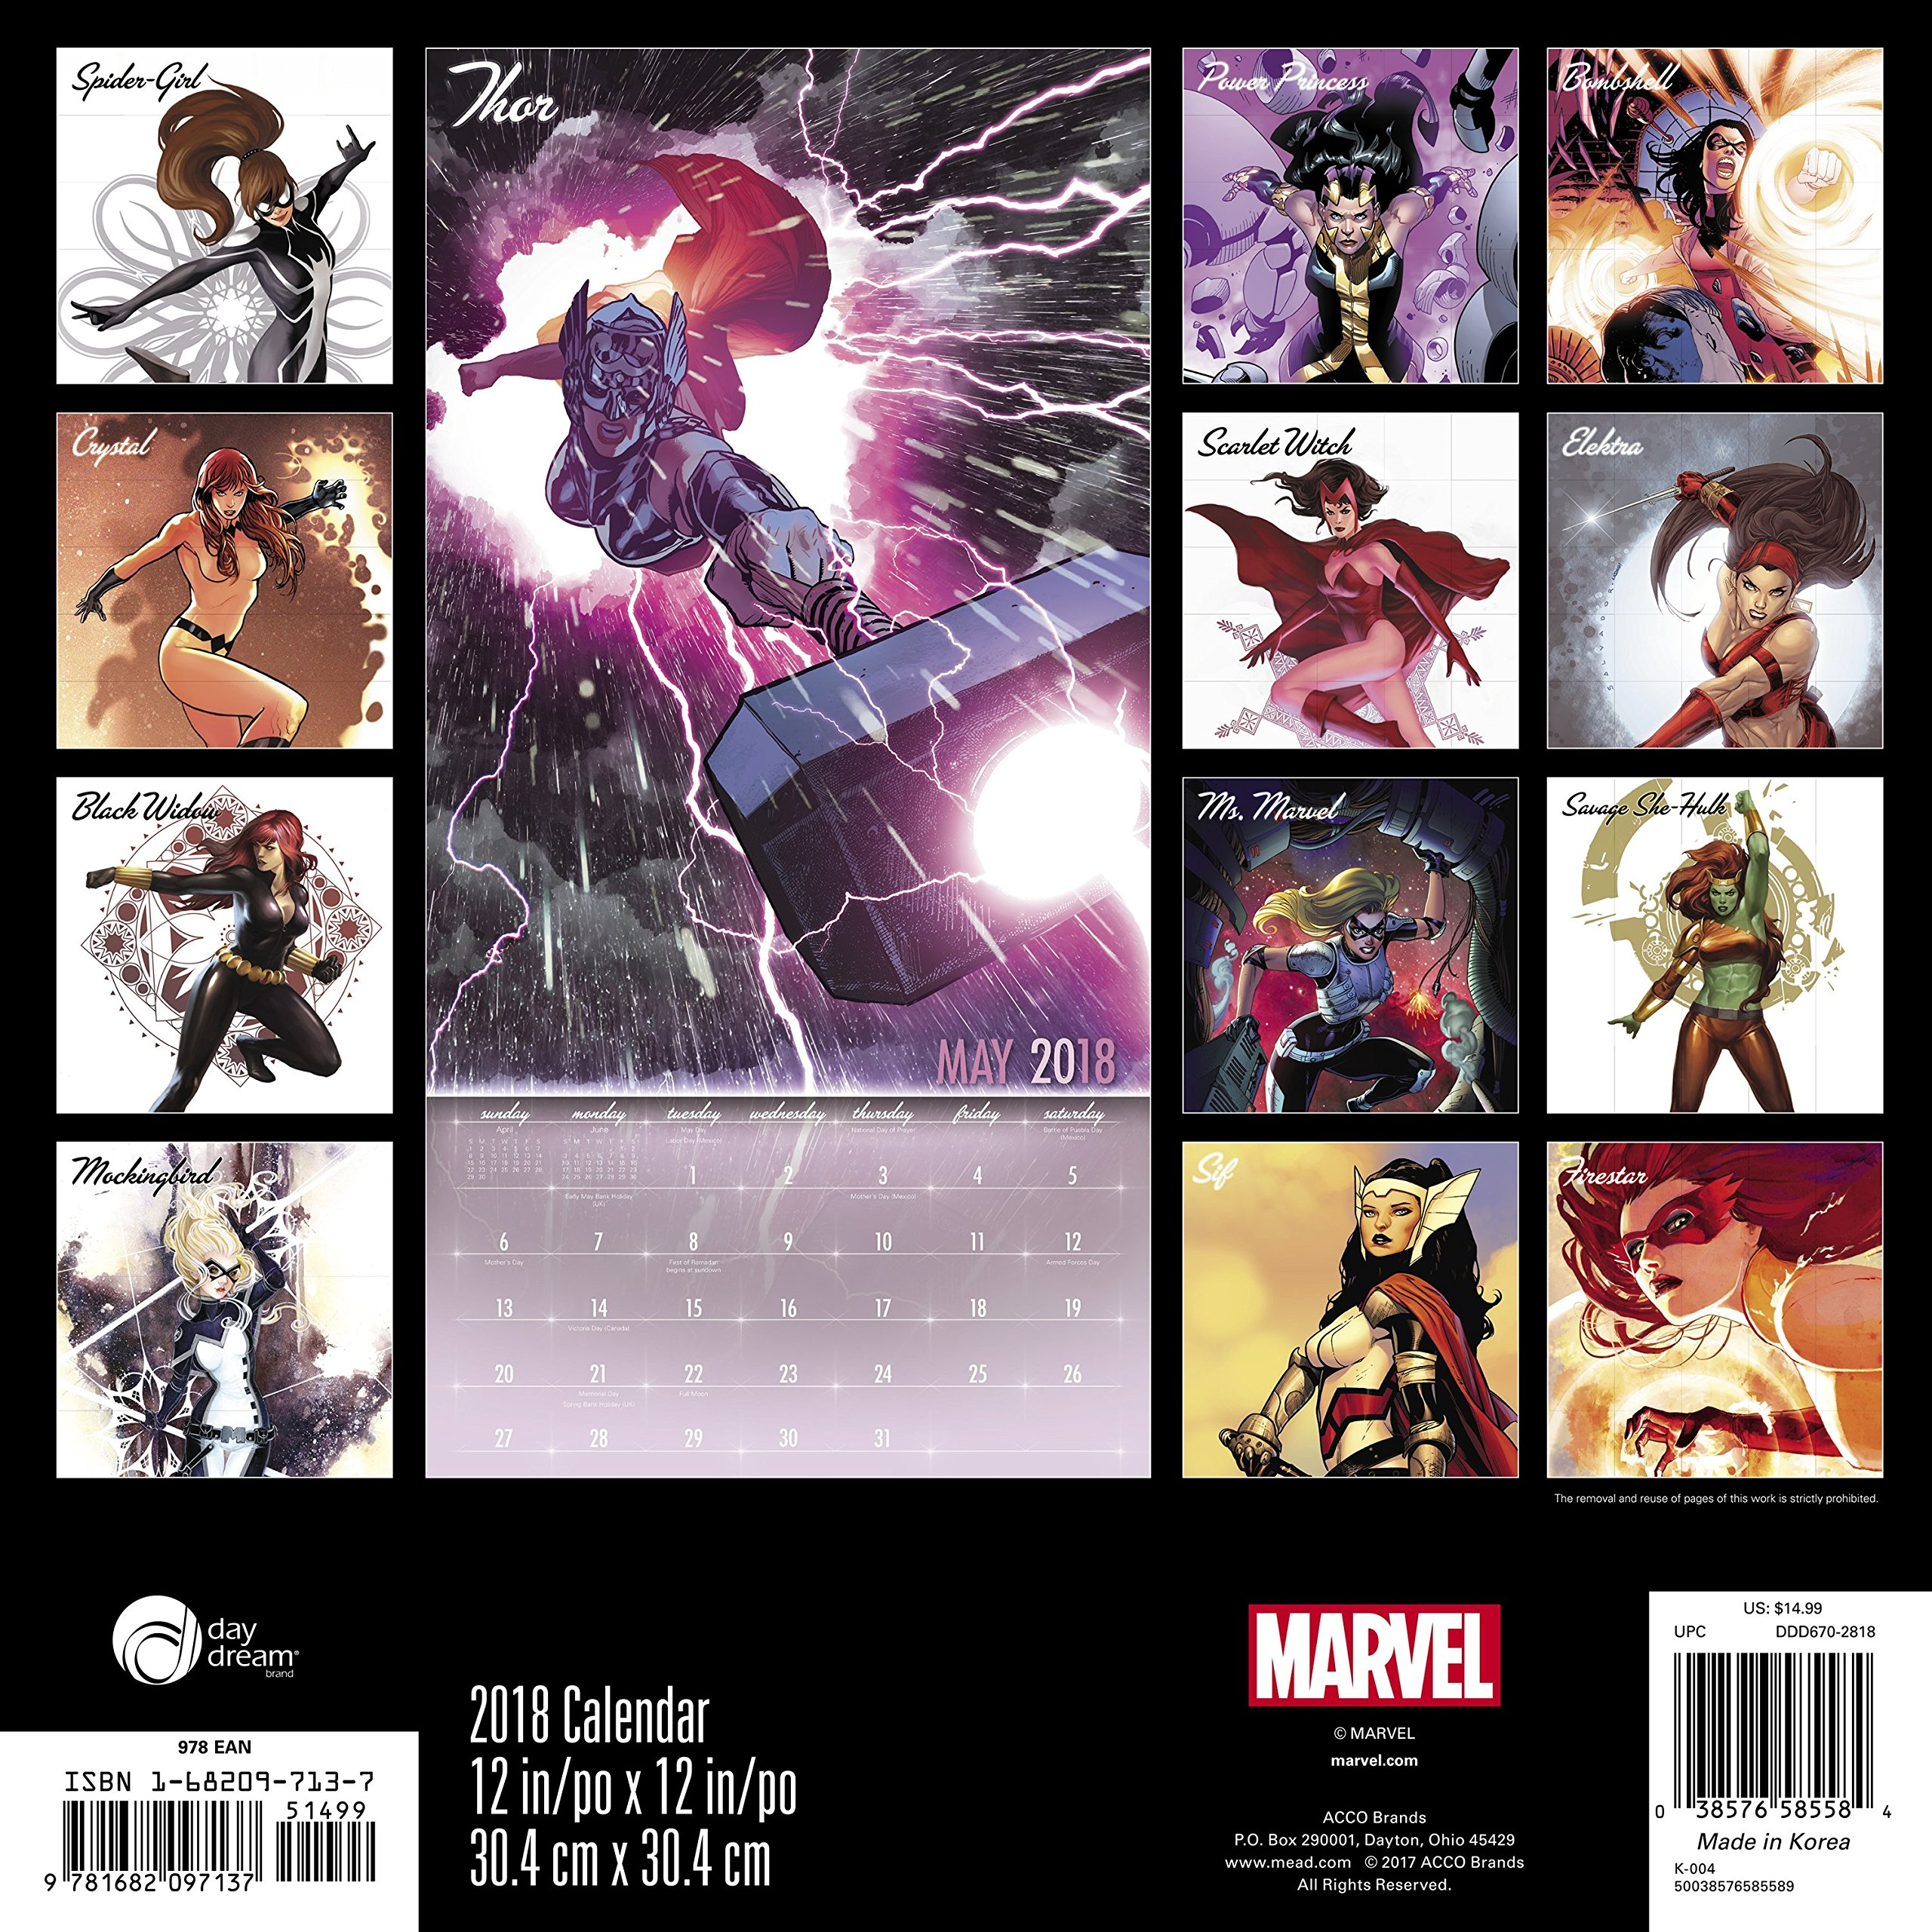 2018 Women of Marvel Wall Calendar (Day Dream): Day Dream